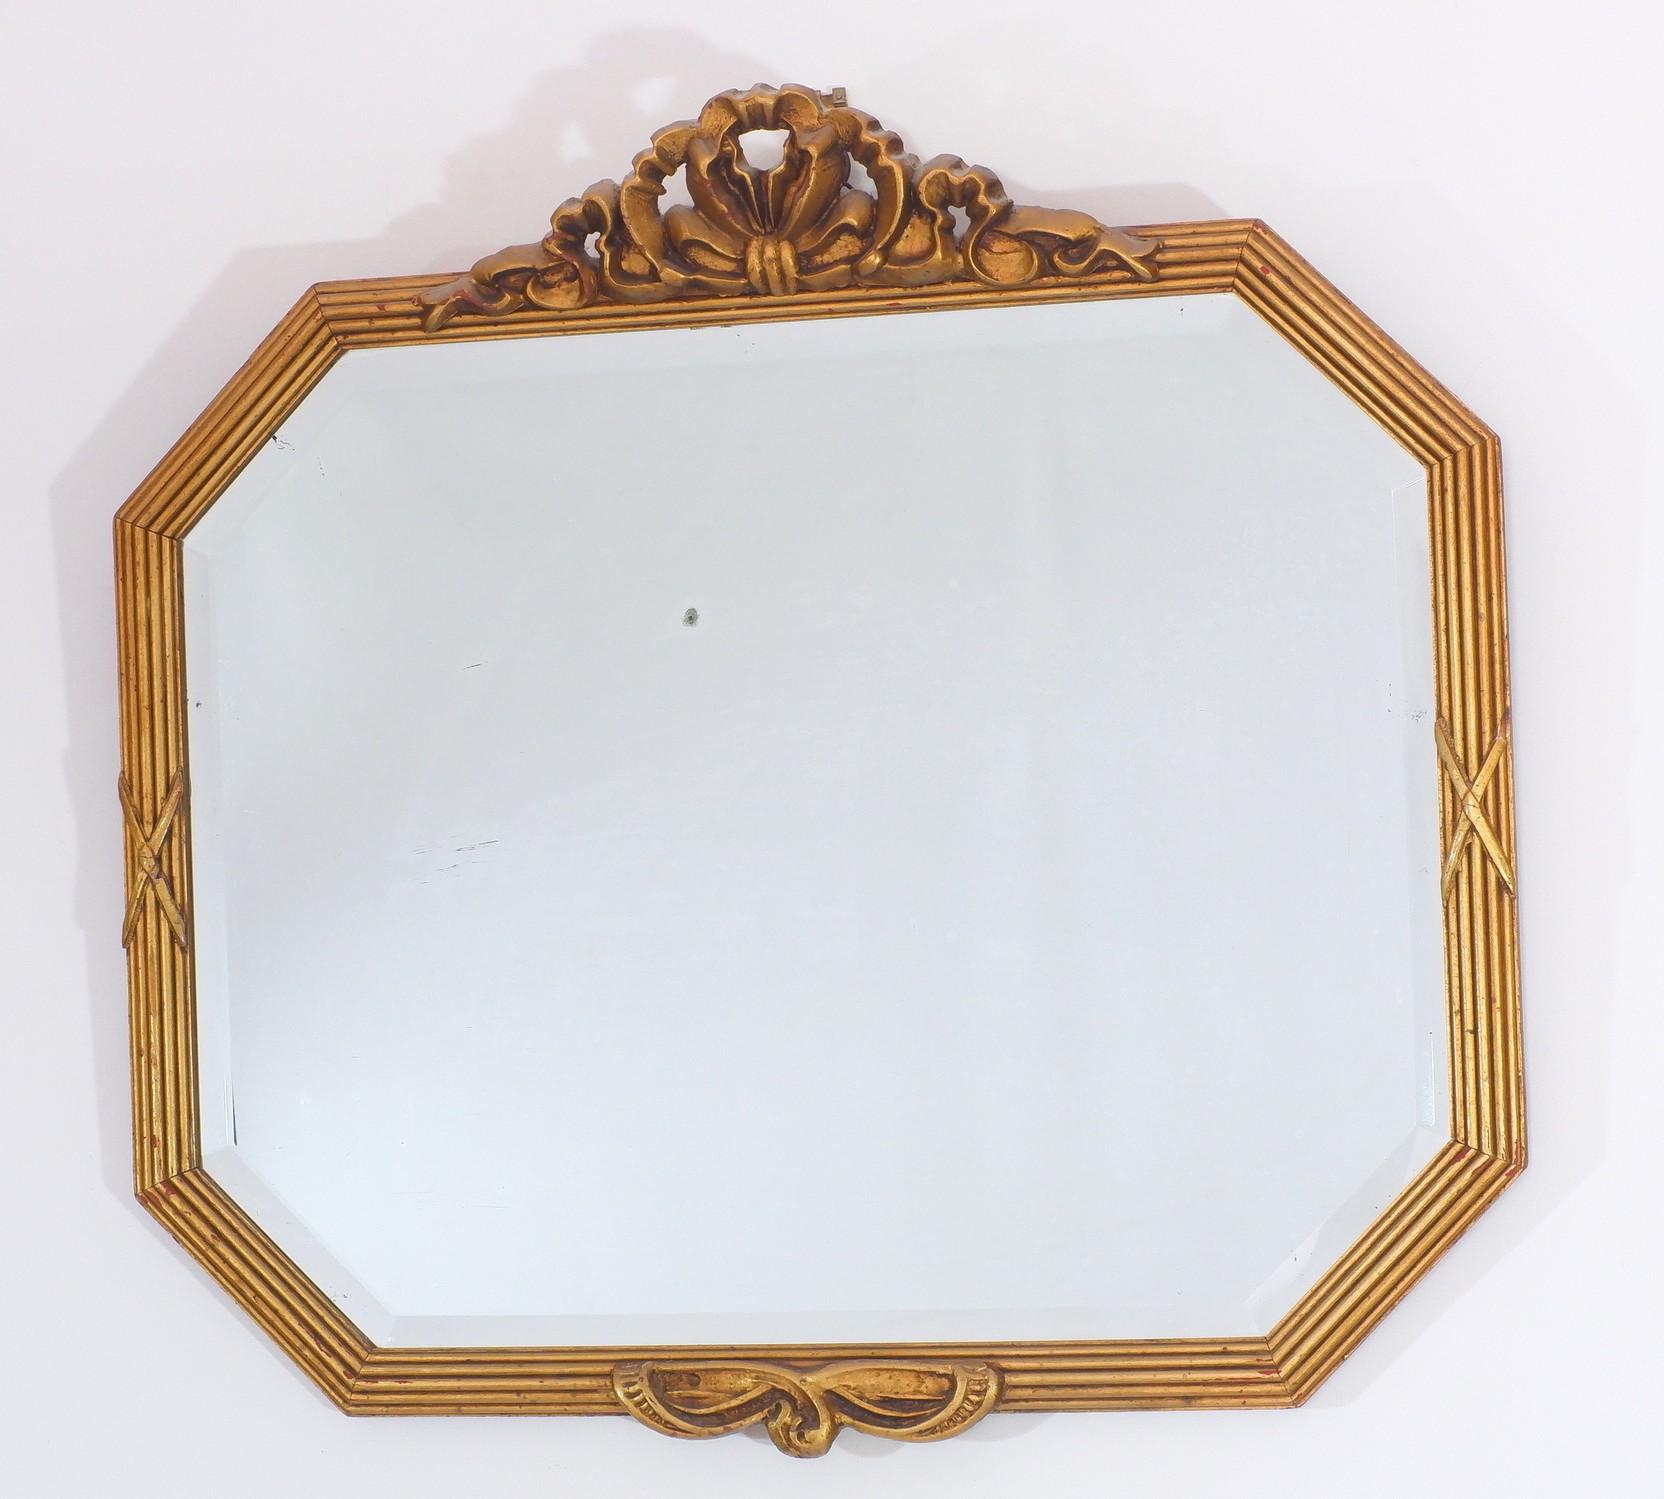 'Vintage Giltwood and Moulded Gesso Bevelled Mirror'